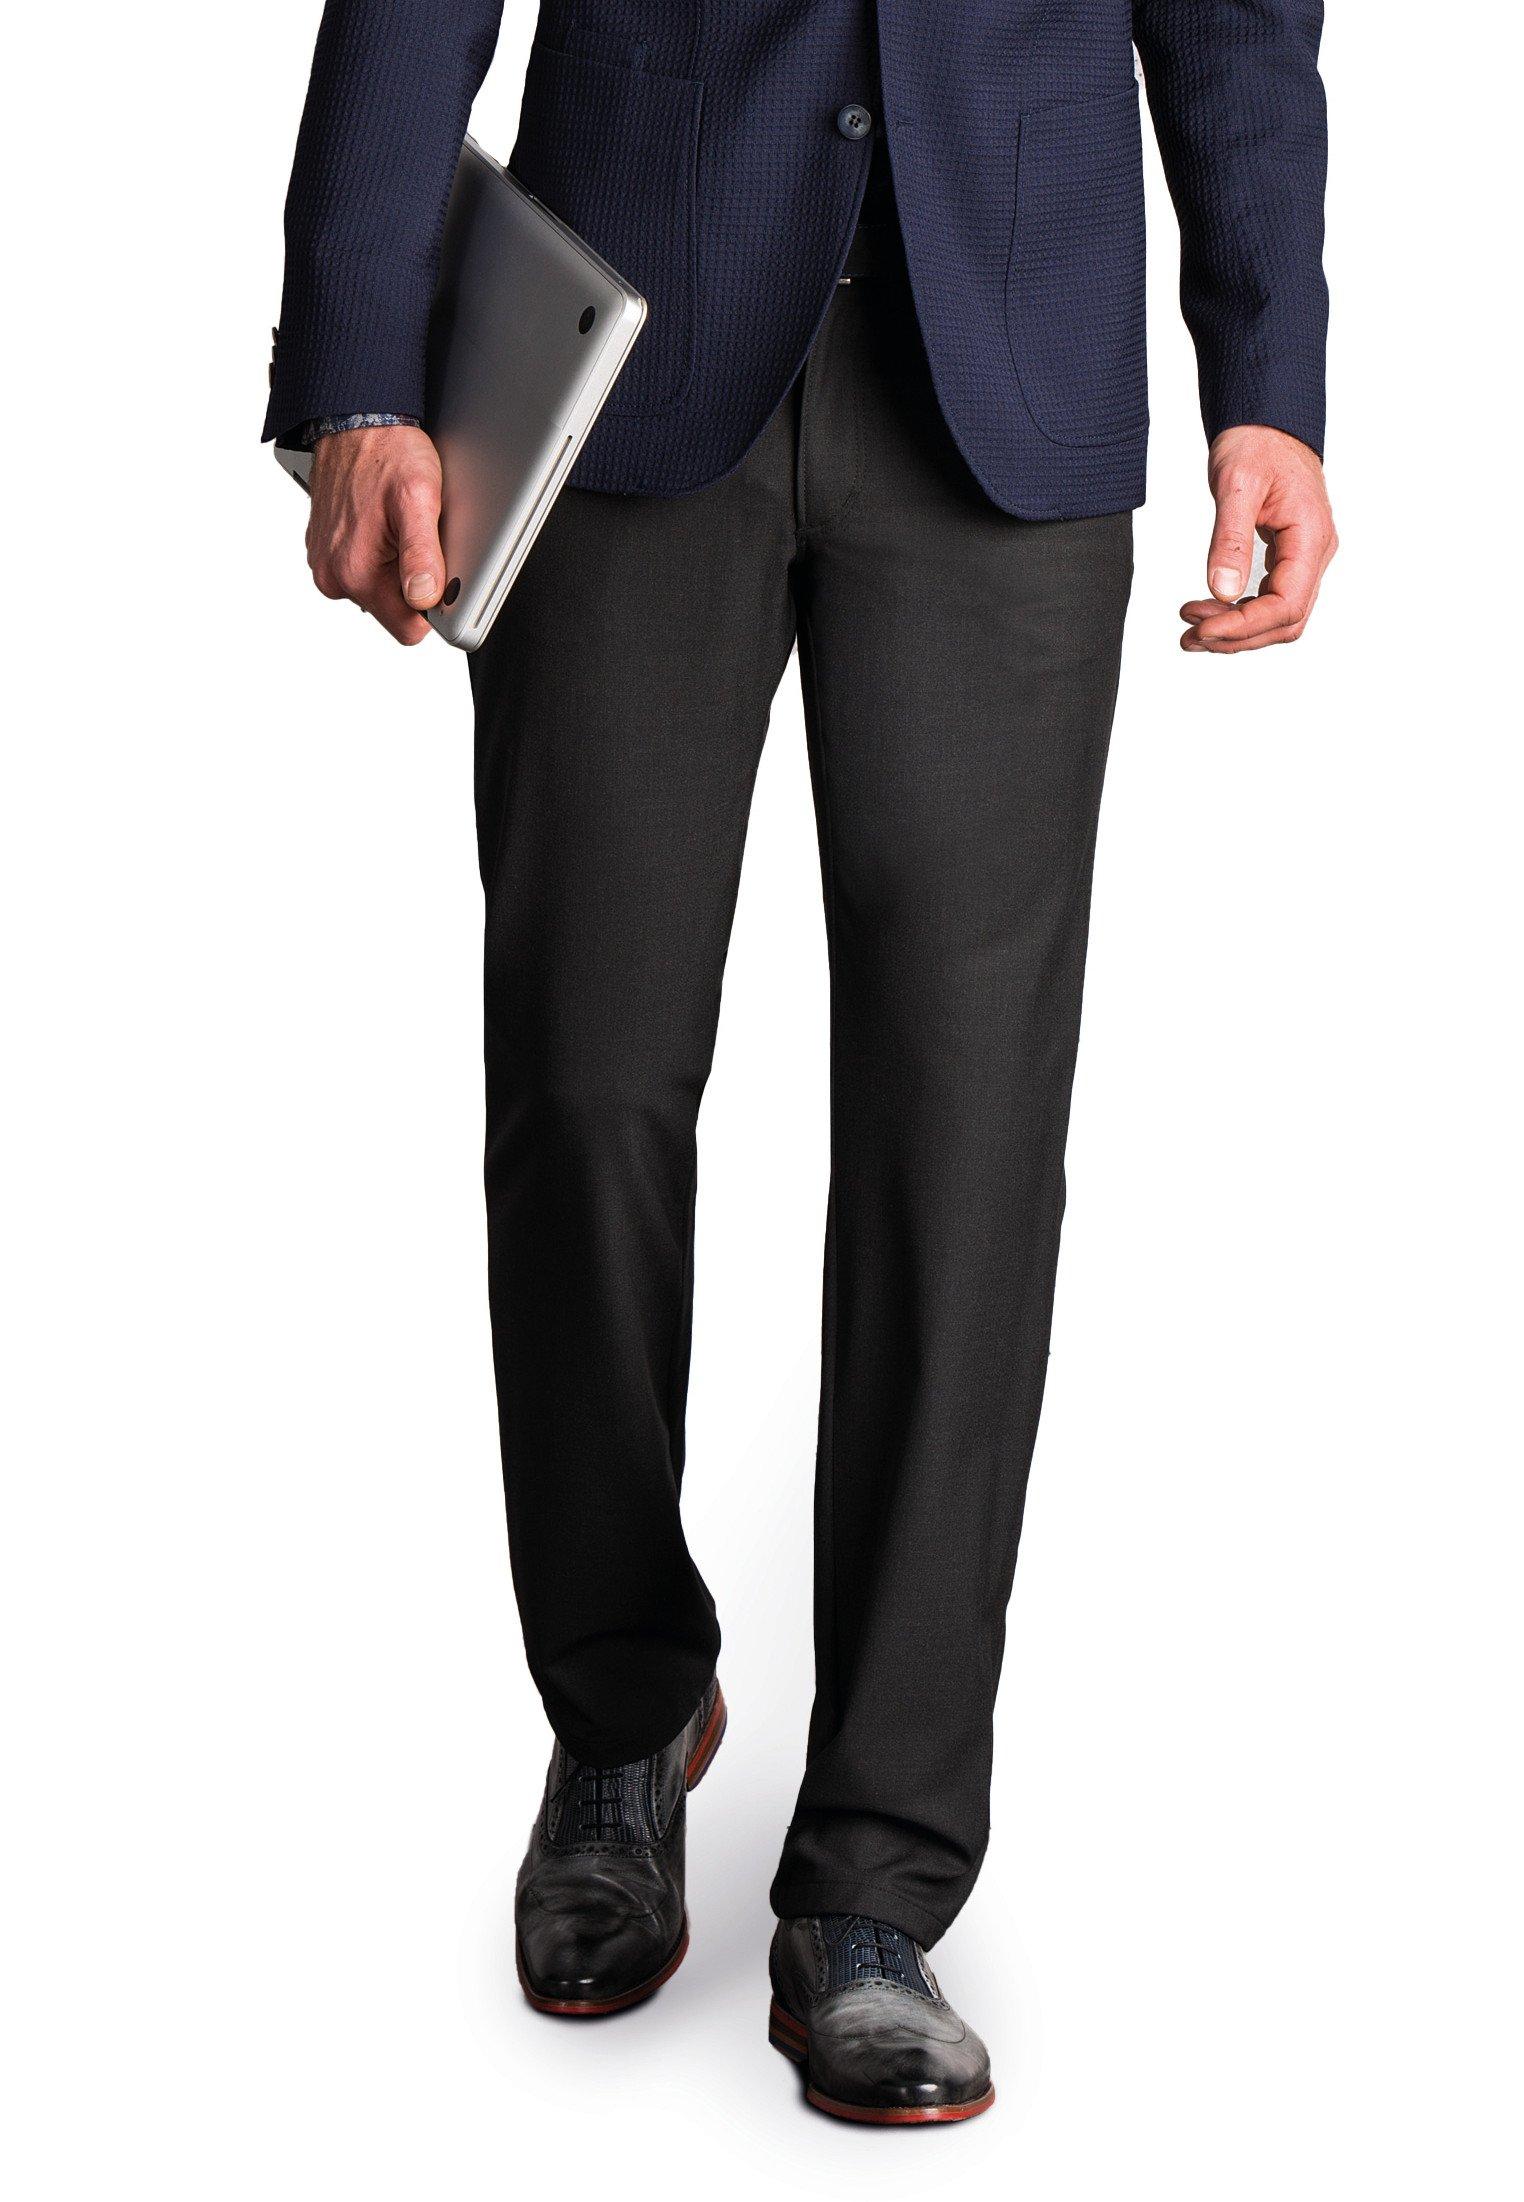 Herren CERAMICA Style 177 - Anzughose - anthrazit